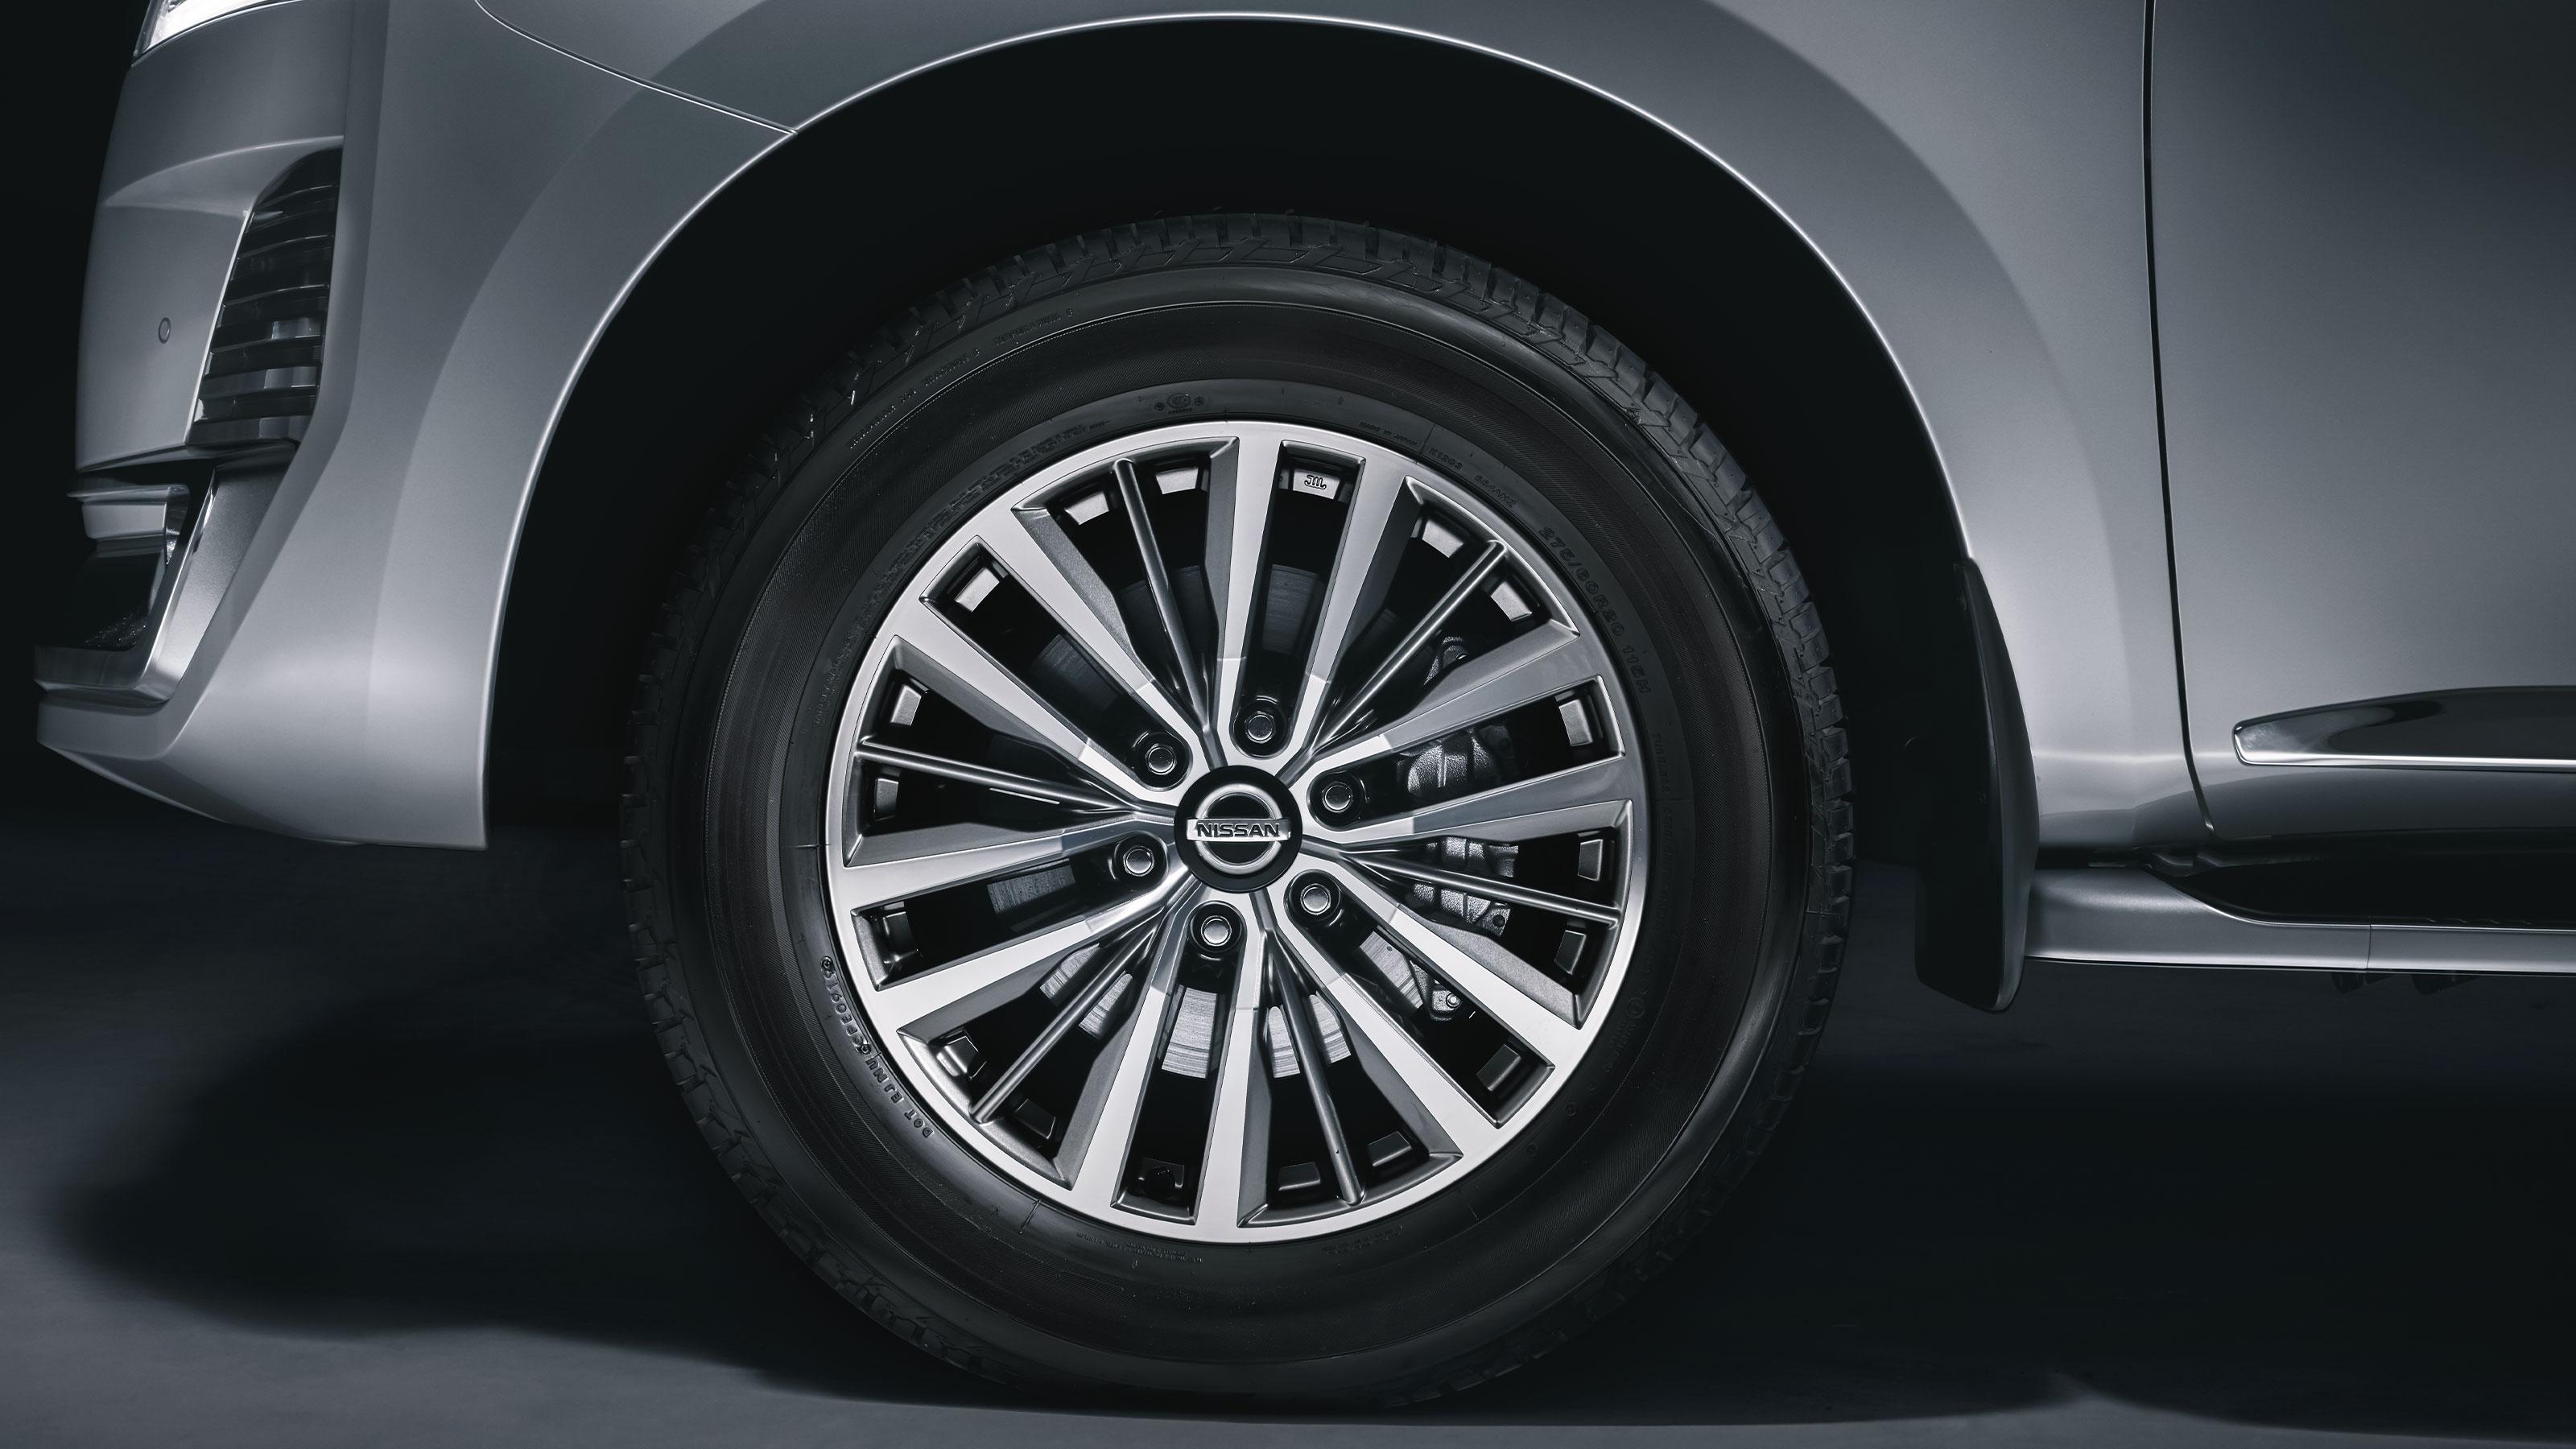 2020 NISSAN PATROL front wheel and rim